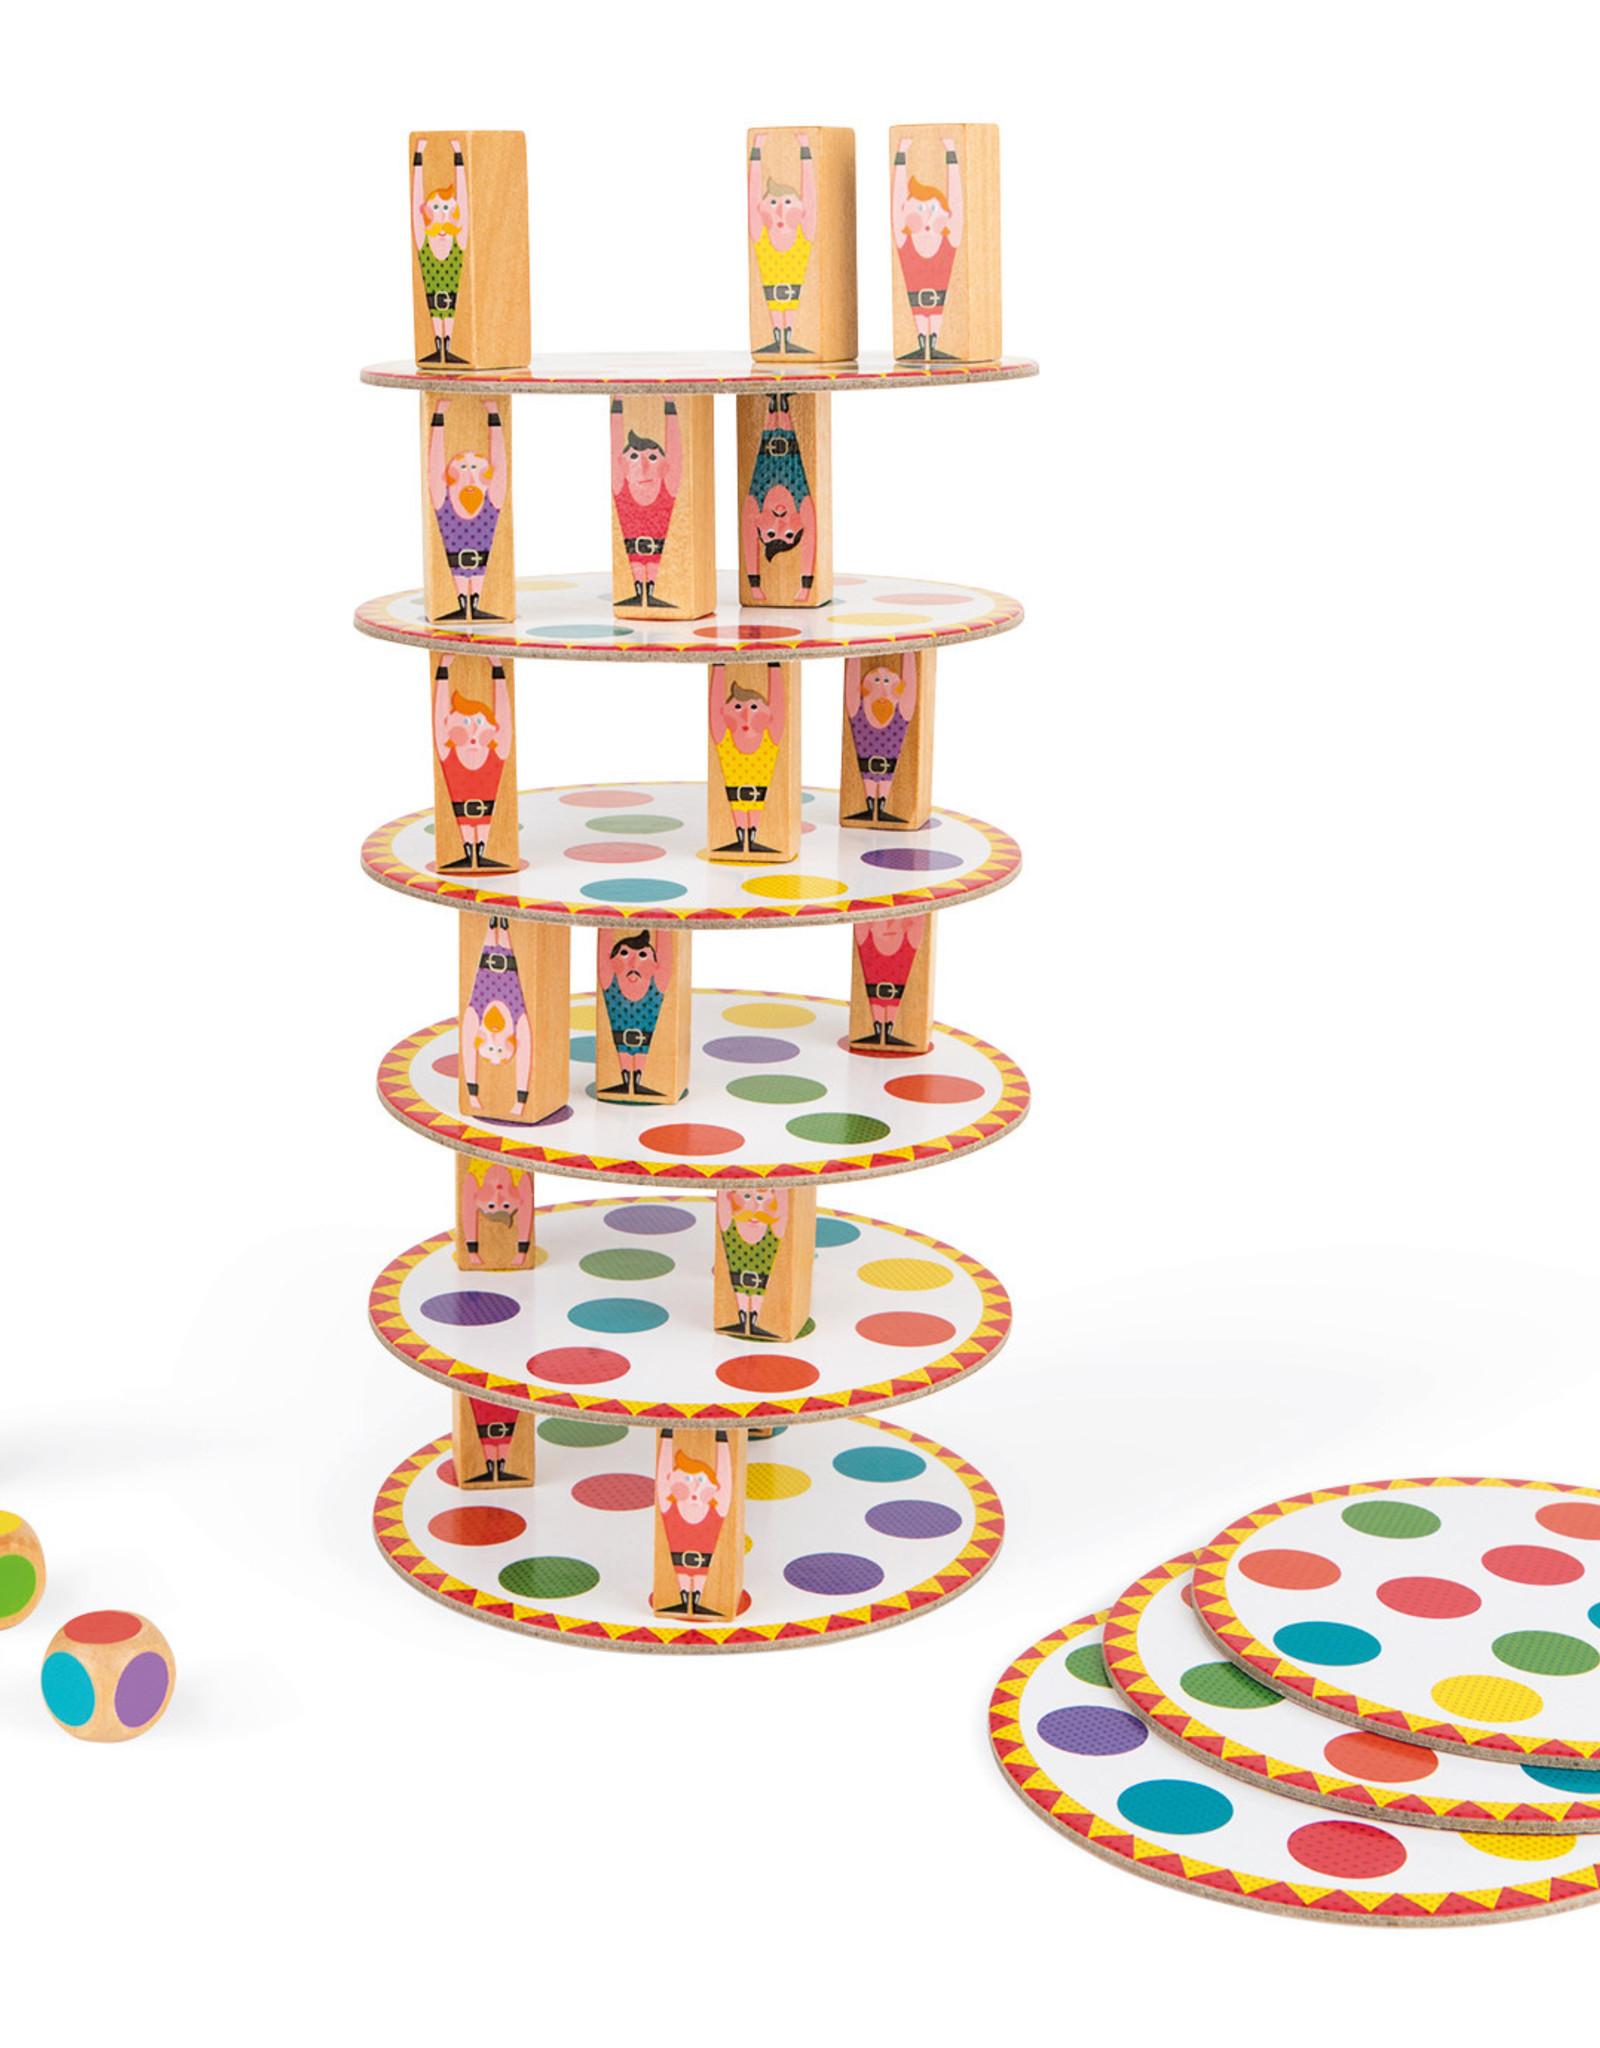 Janod Acrobat Balance Game